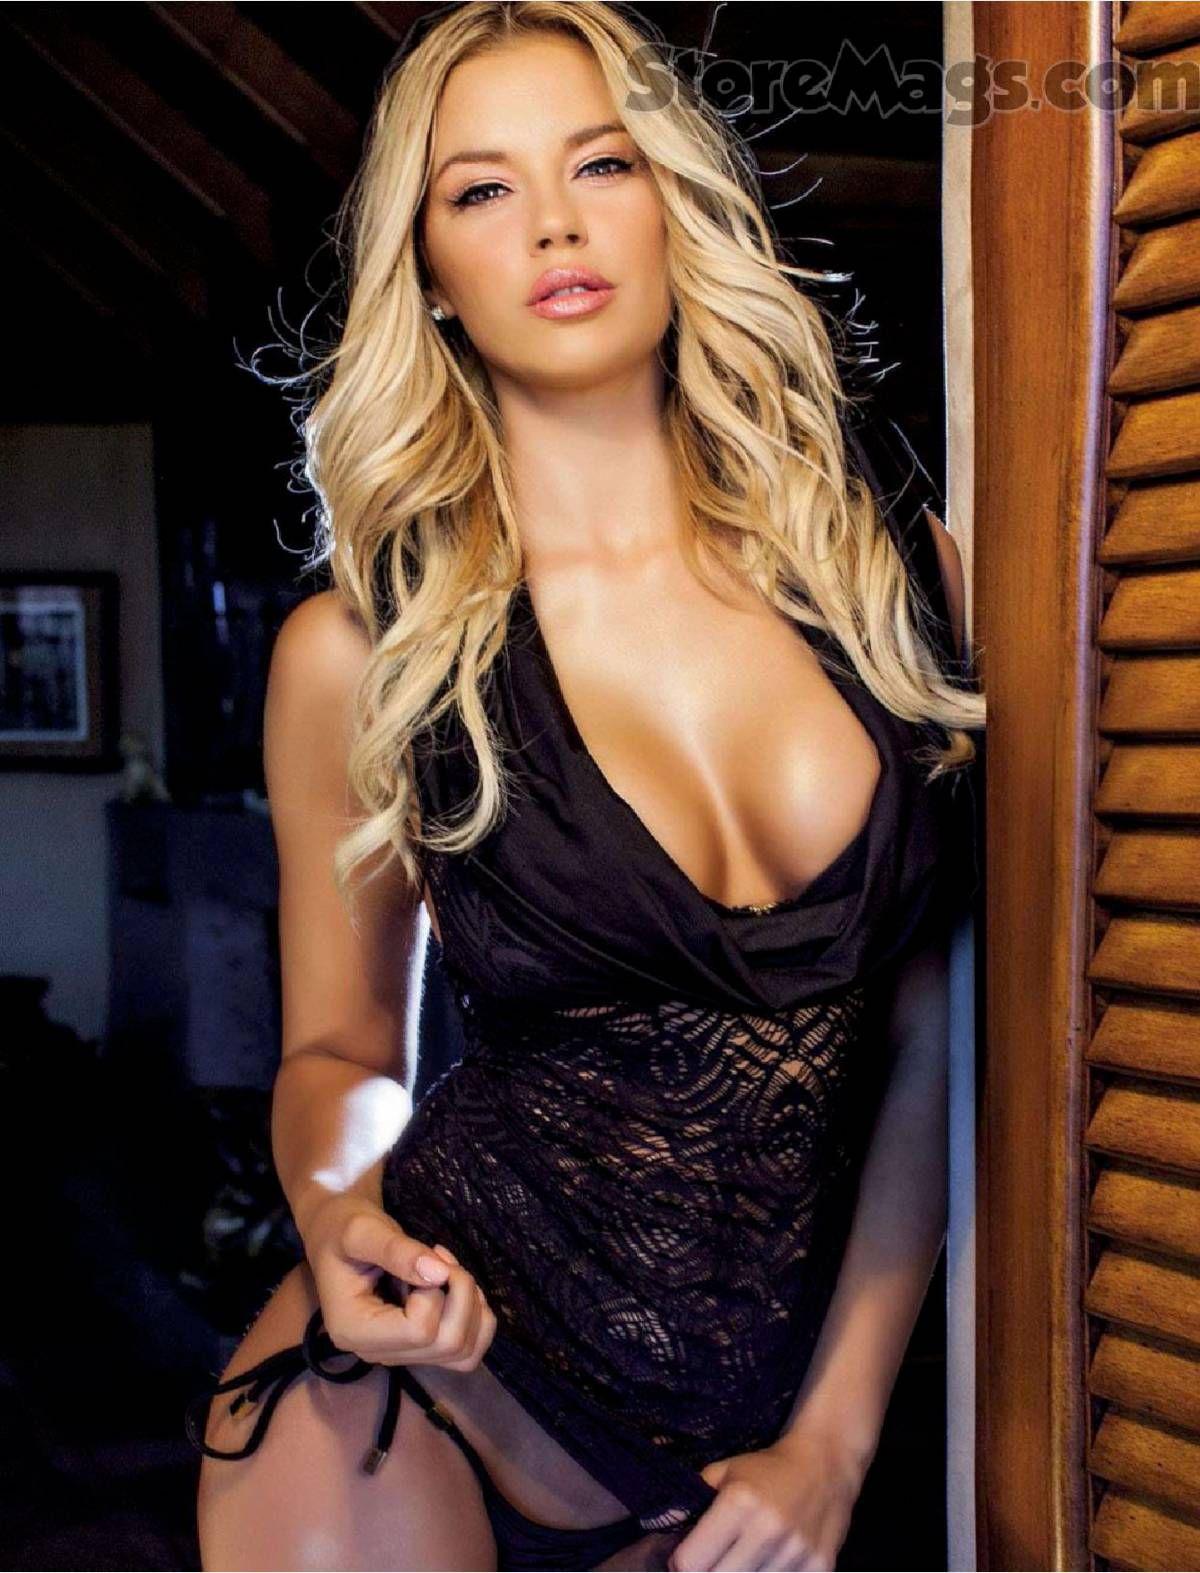 Blond hot women Top 10 Sexiest Girls With Blonde Hair Beautiful Women Looks Hot With Blonde Hair Top 10 Ranker